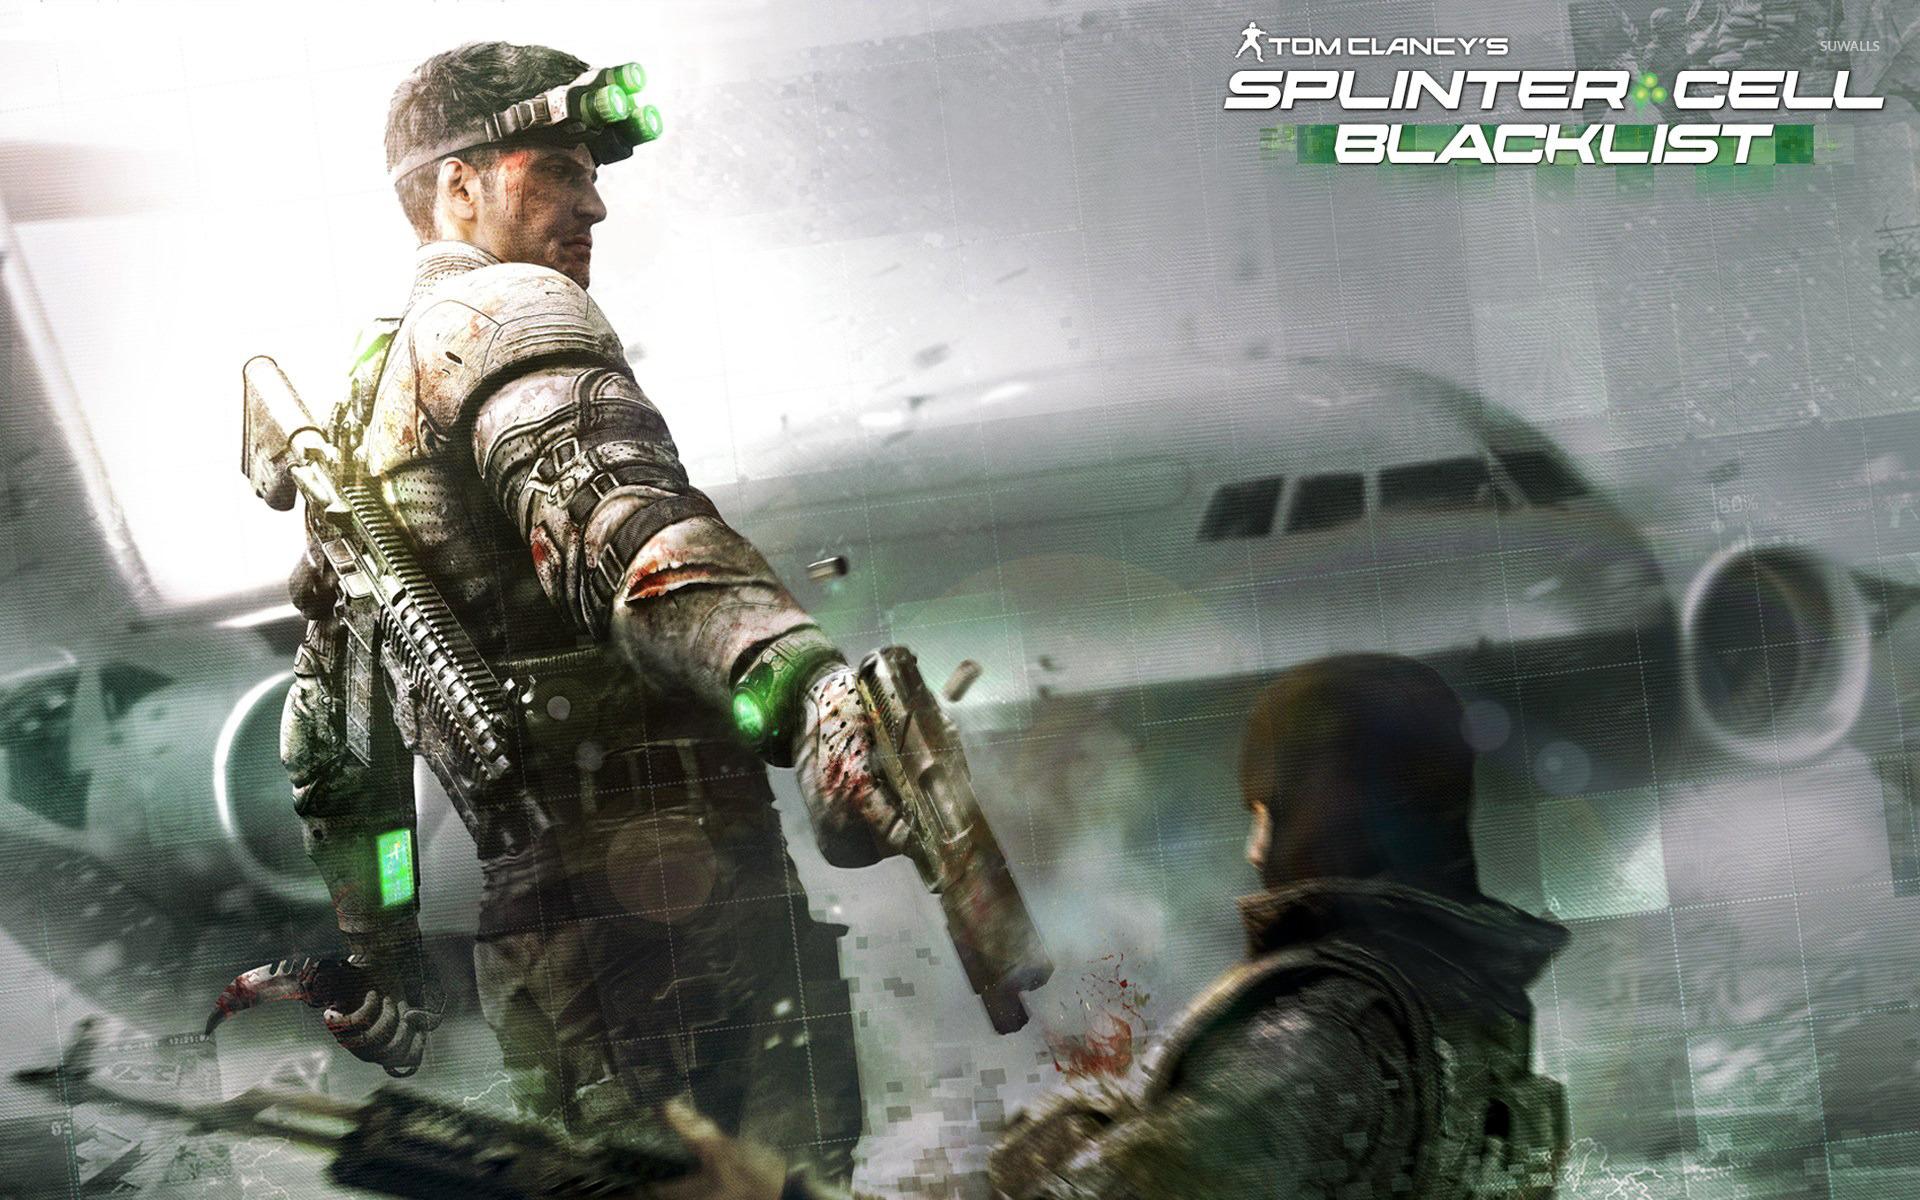 Tom Clancys Splinter Cell Blacklist wallpaper Game